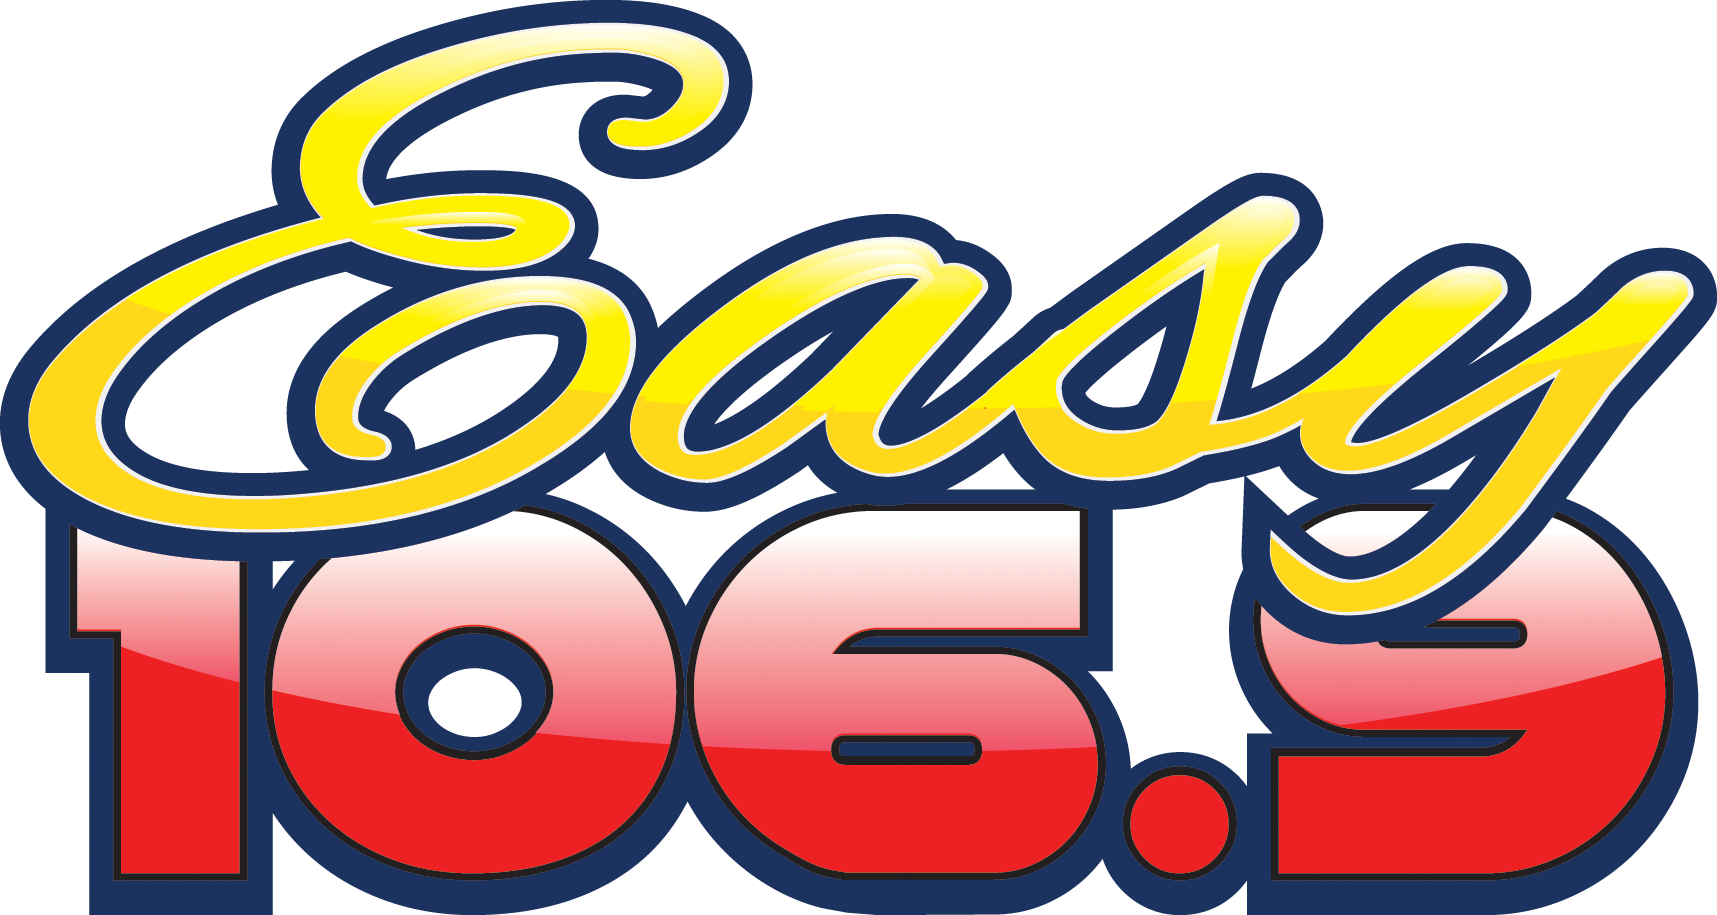 EASY 1069 - logo.png